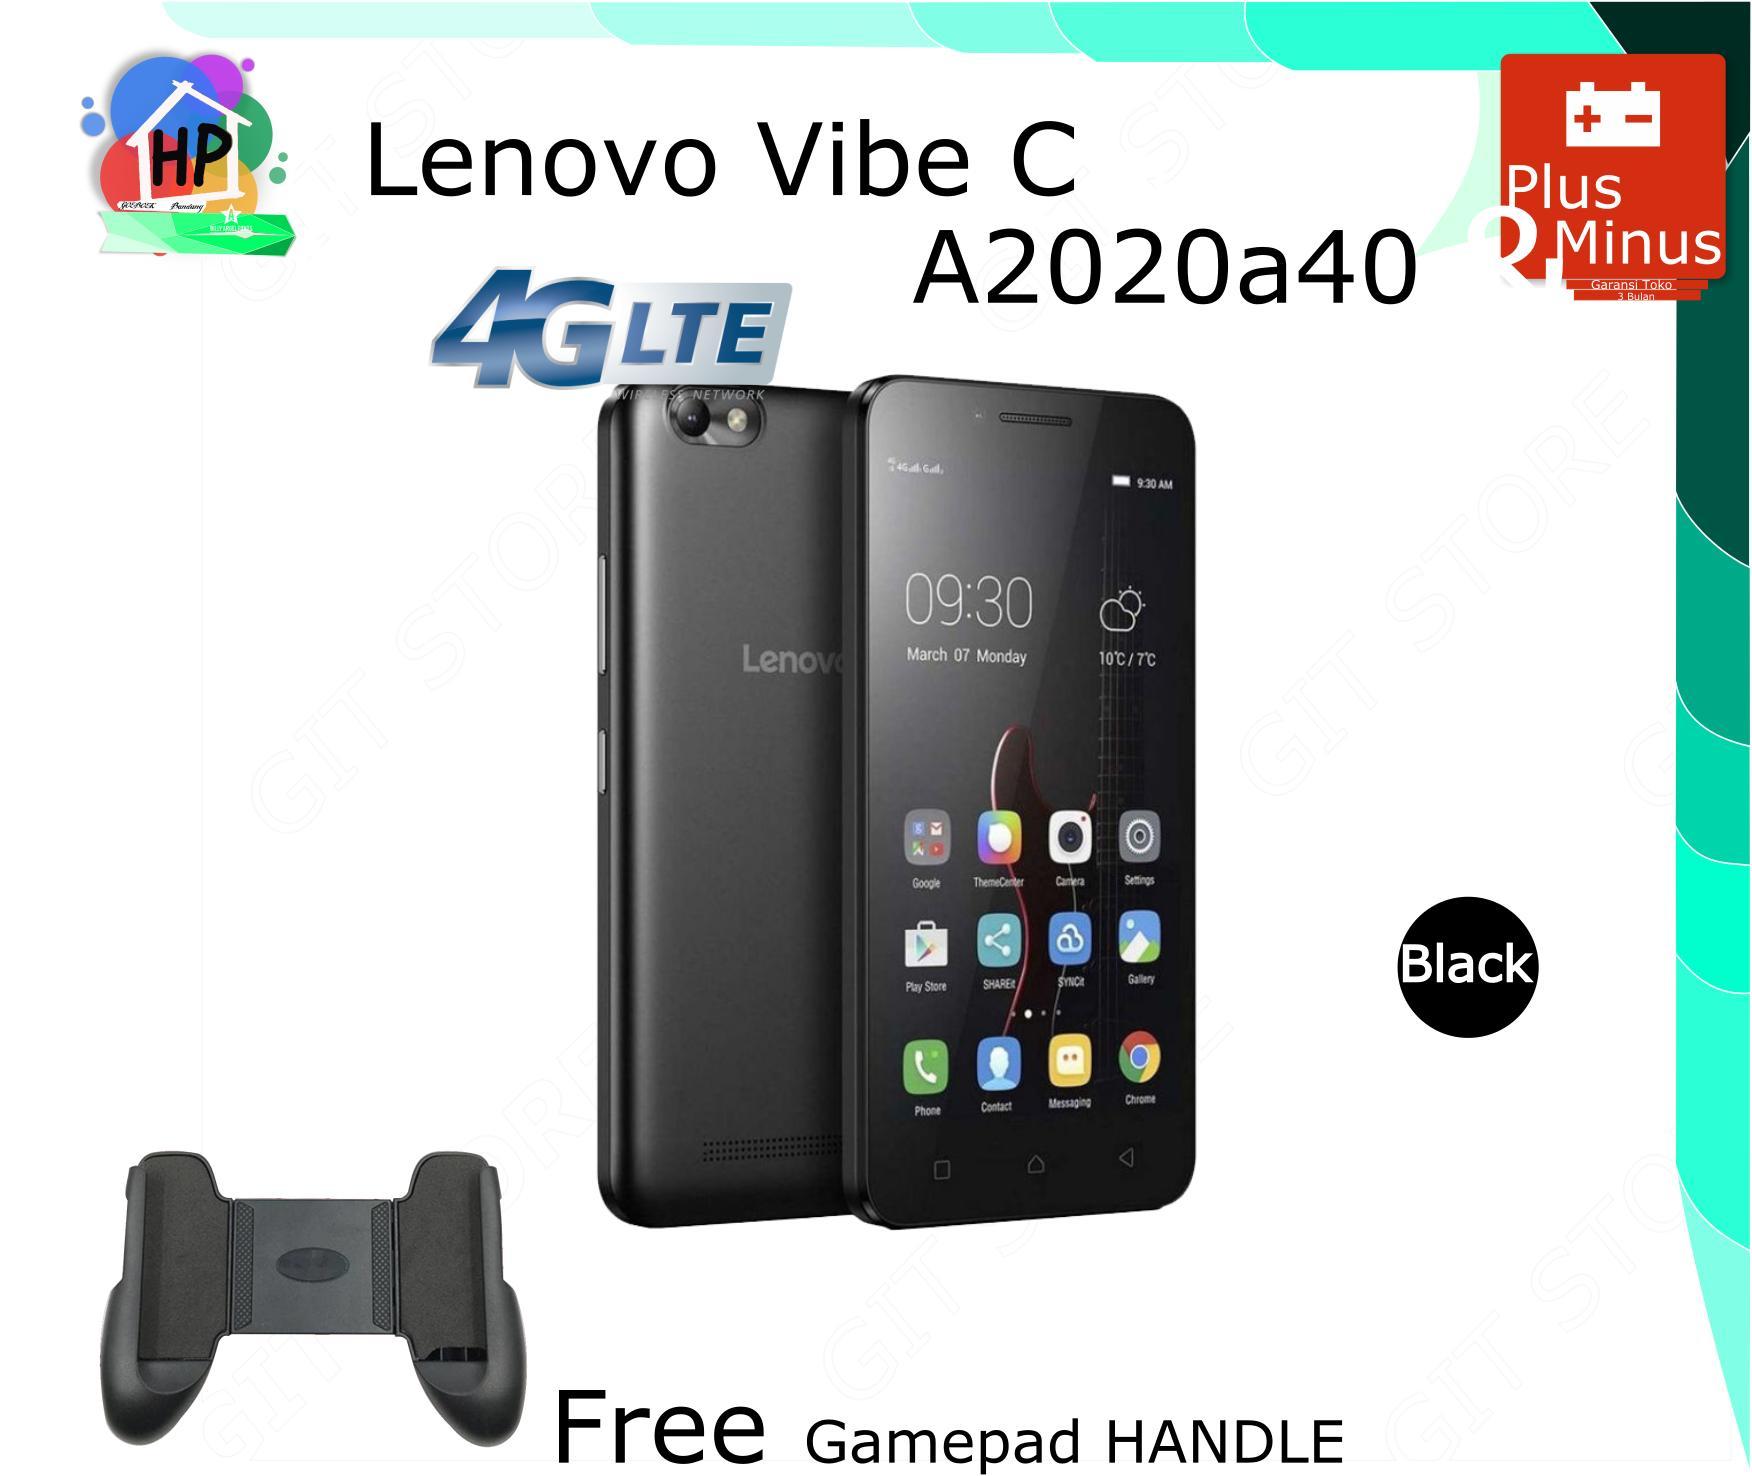 Lenovo Vibe C A2020a40 [16GB 1GB] 4g LTE